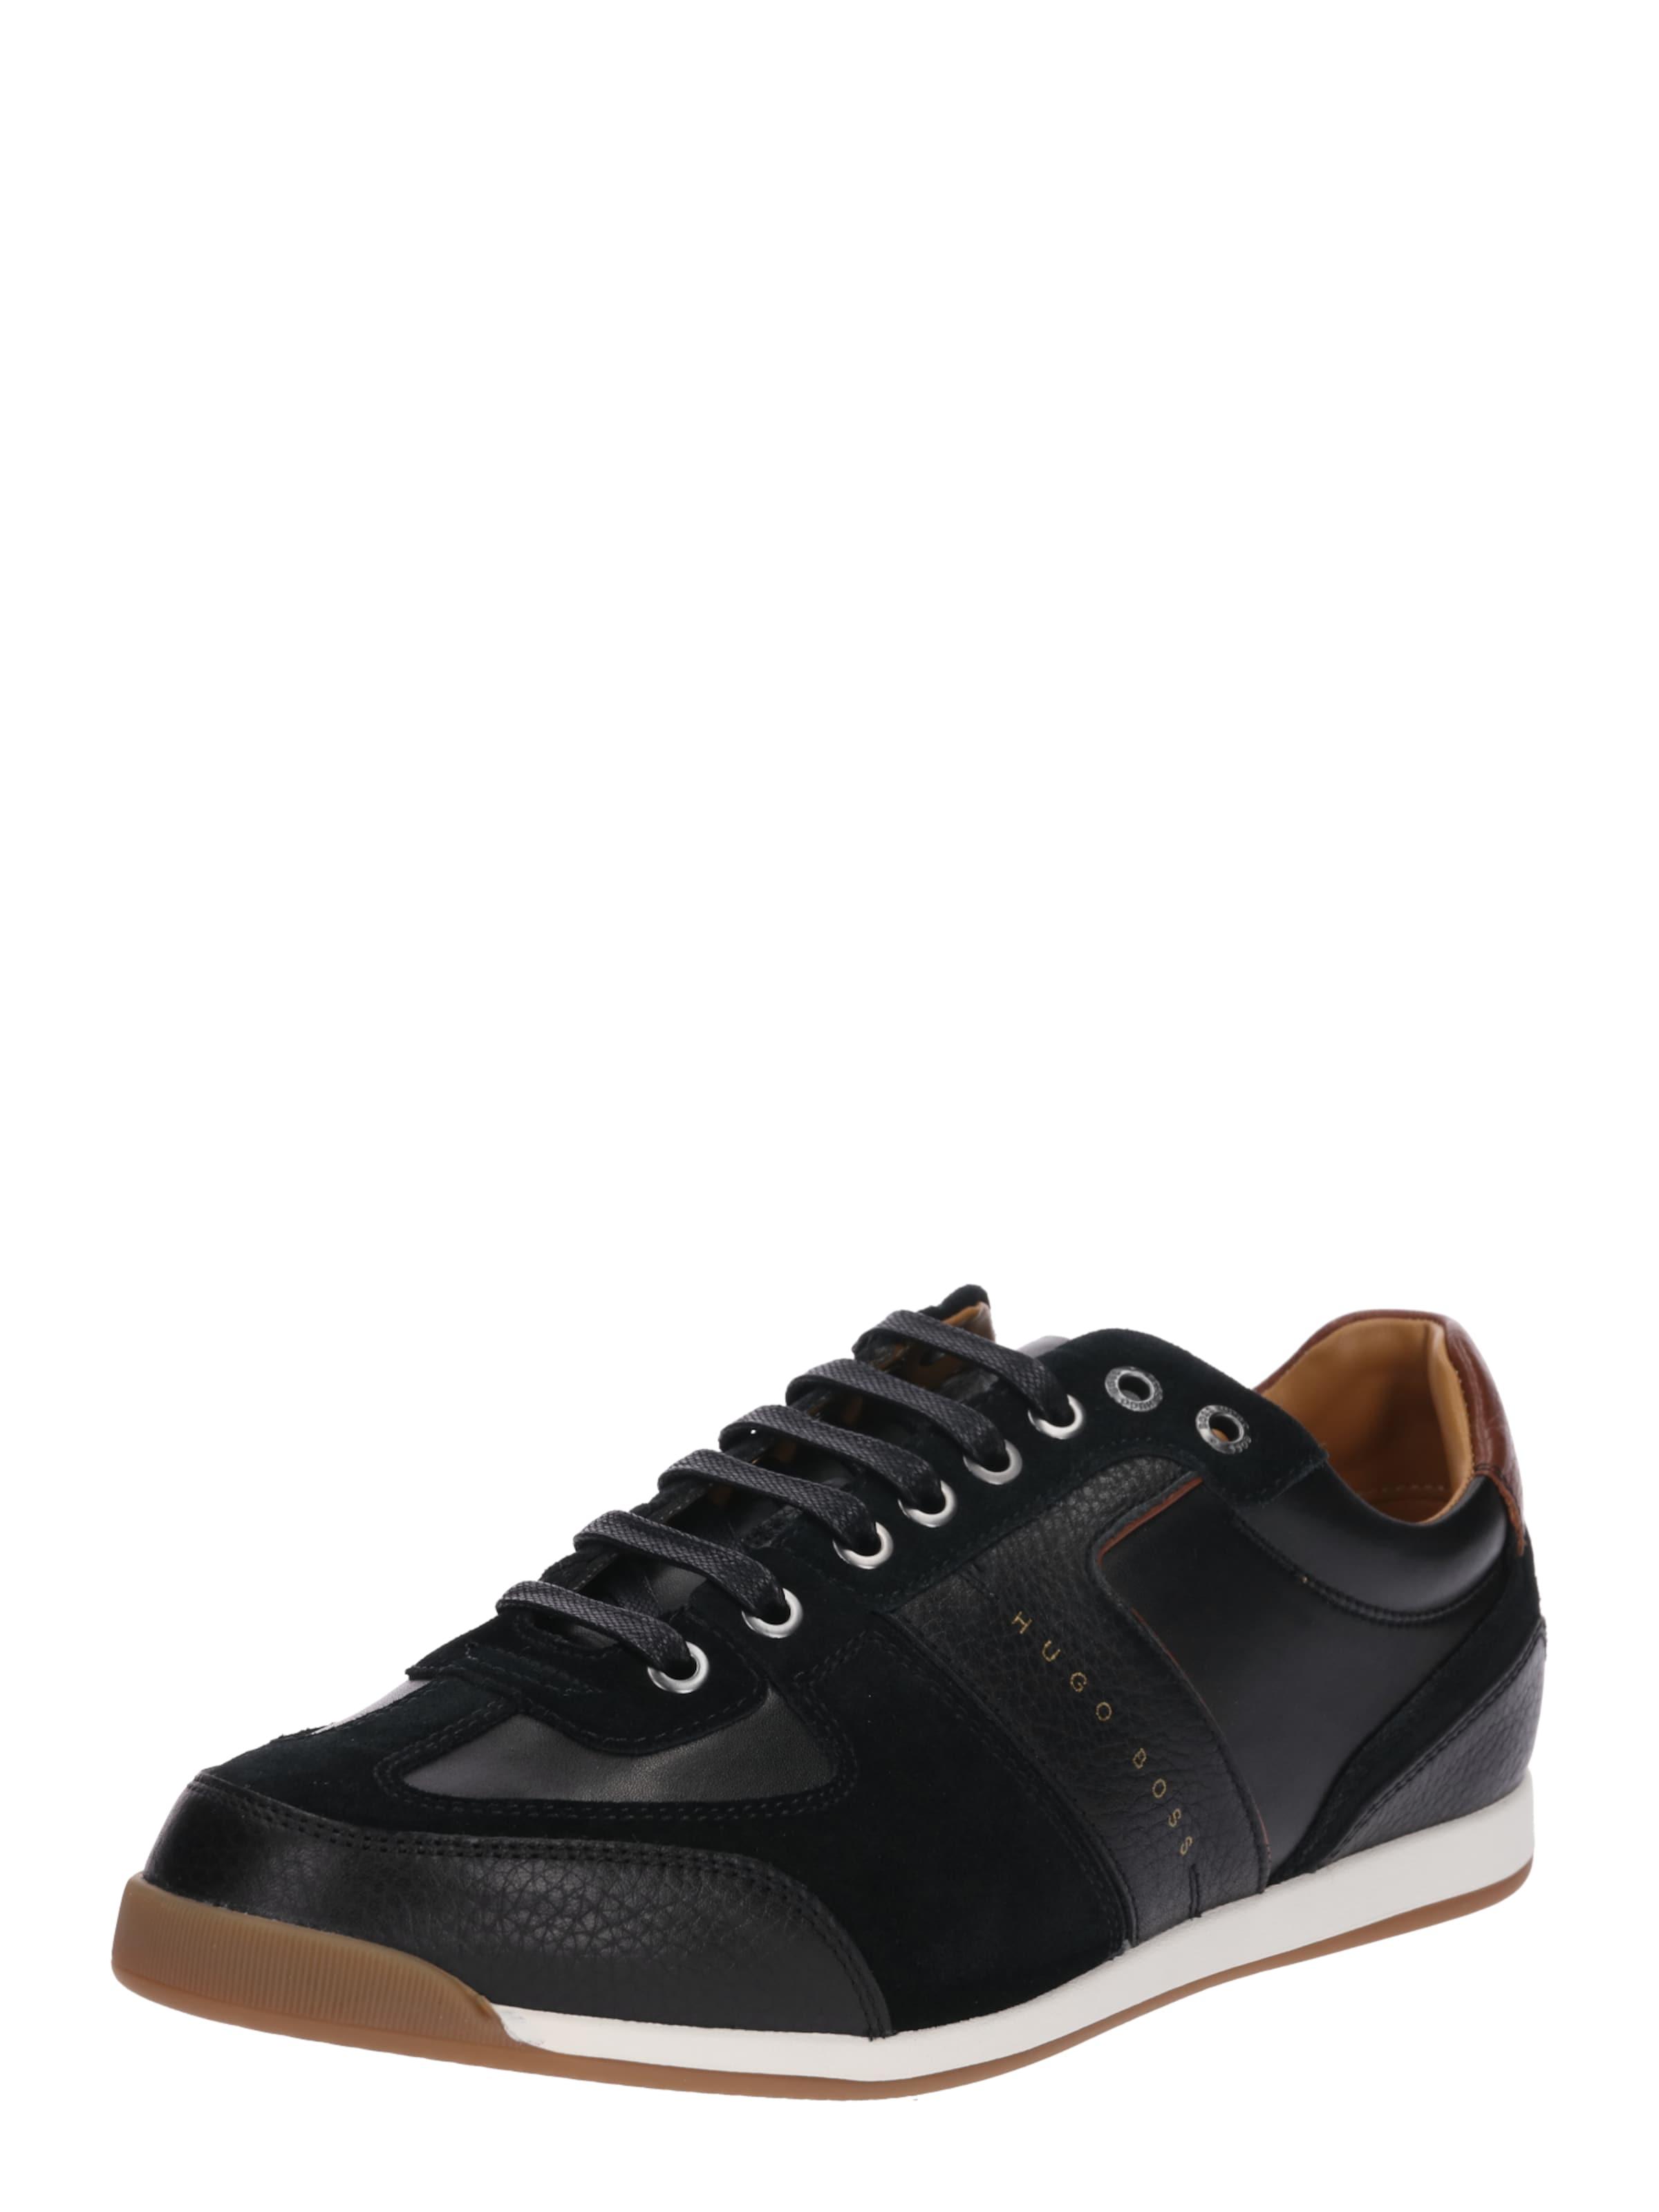 Haltbare Mode billige 'Maze' Schuhe BOSS | Sneaker 'Maze' billige Schuhe Gut getragene Schuhe 896ed2